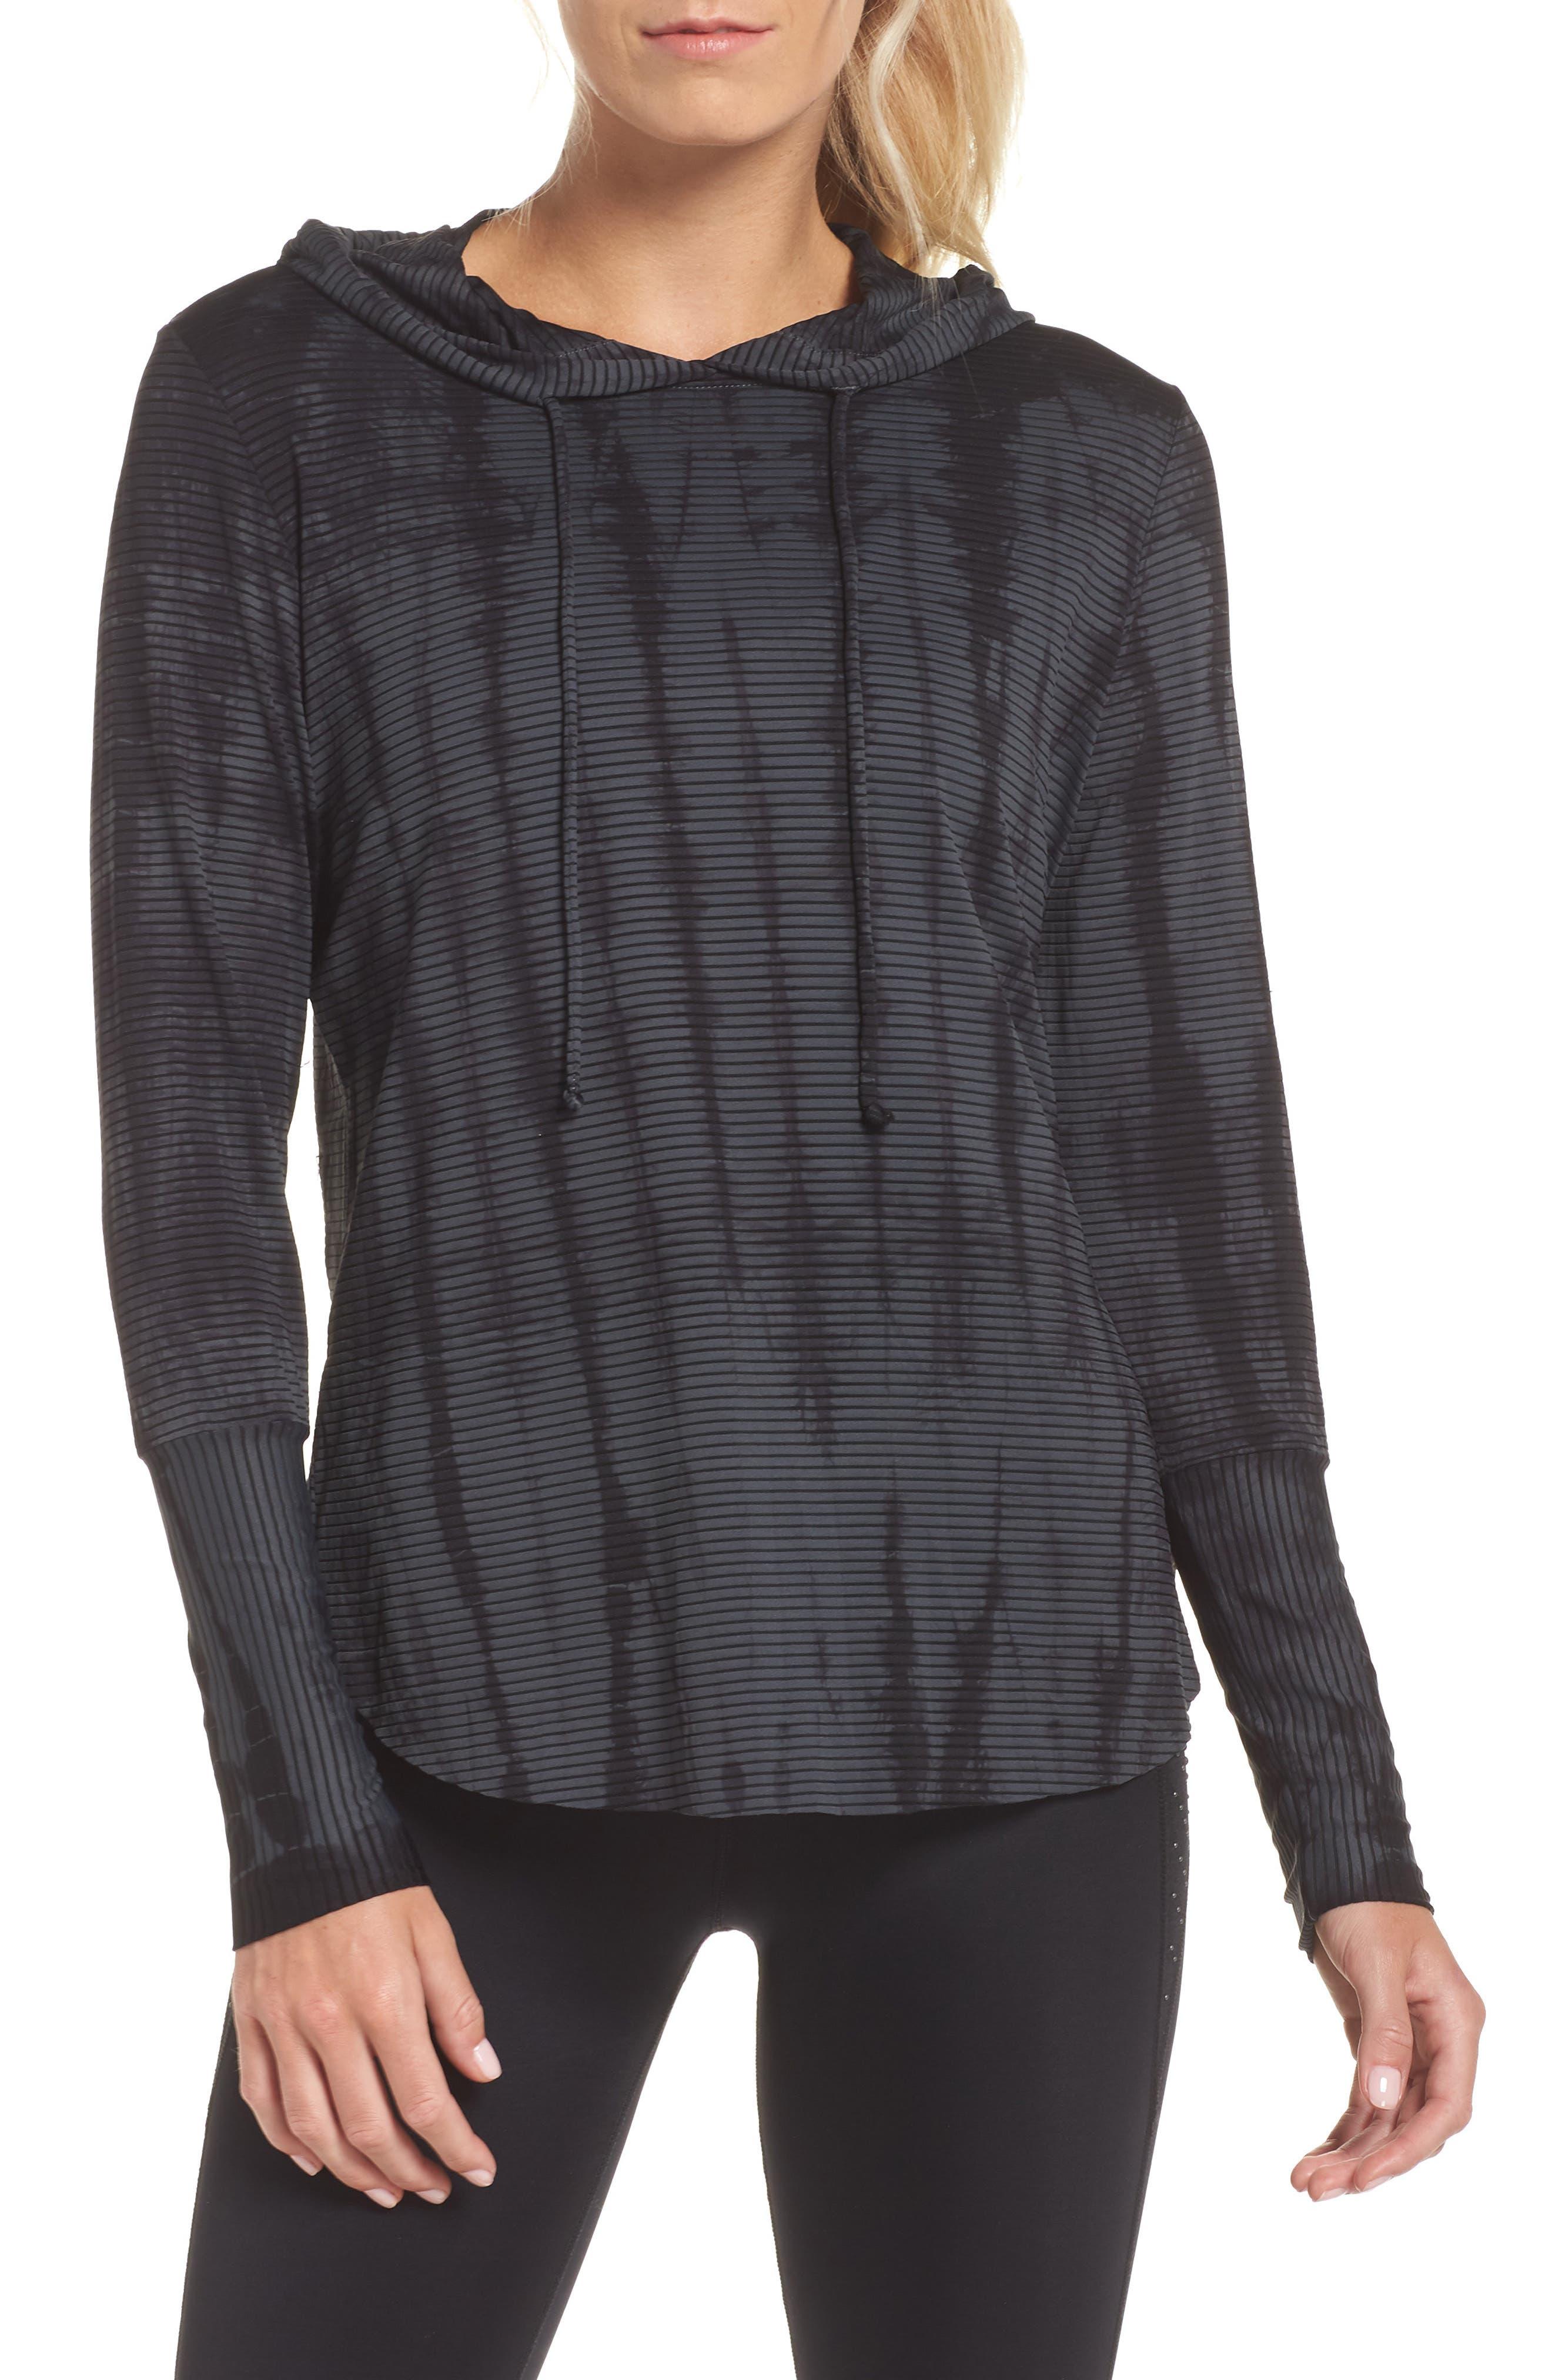 Waves Tie Dye Gray Hooded Pullover,                         Main,                         color, DARK GREY